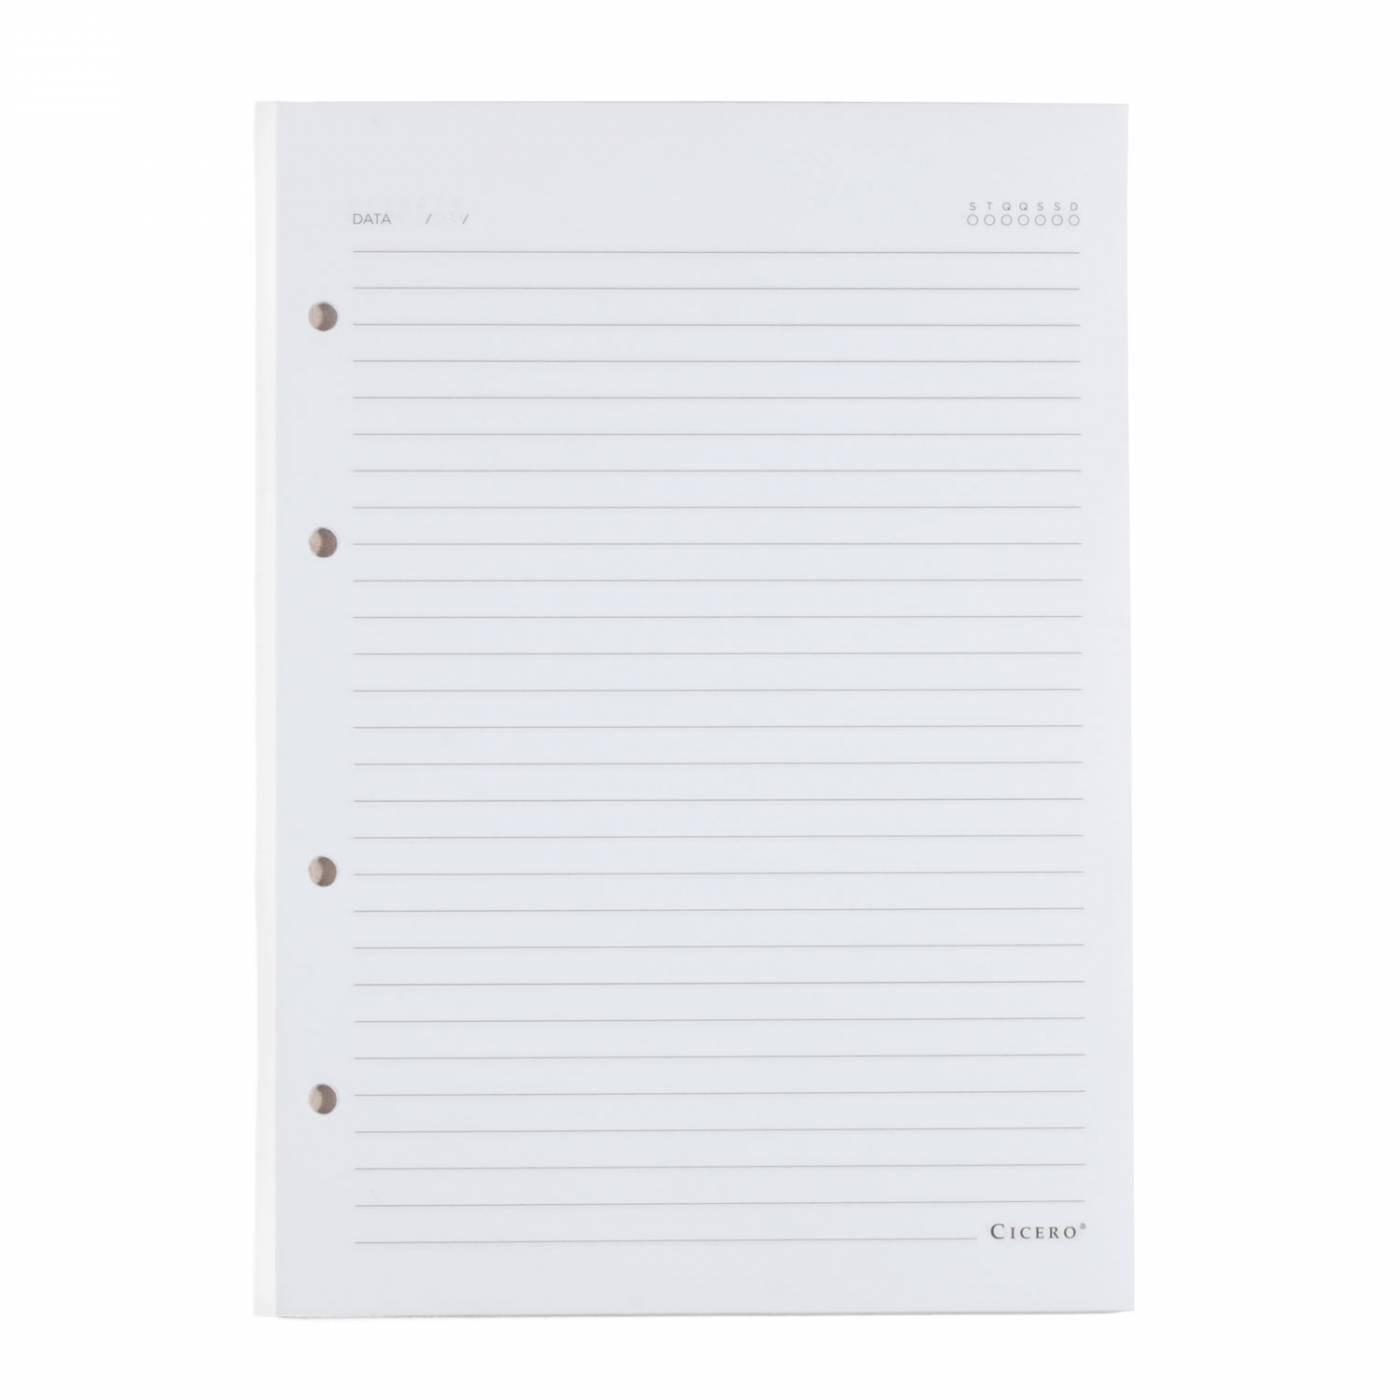 Refil Caderno Fichario Cicero Pautado Folha Branca 90gr